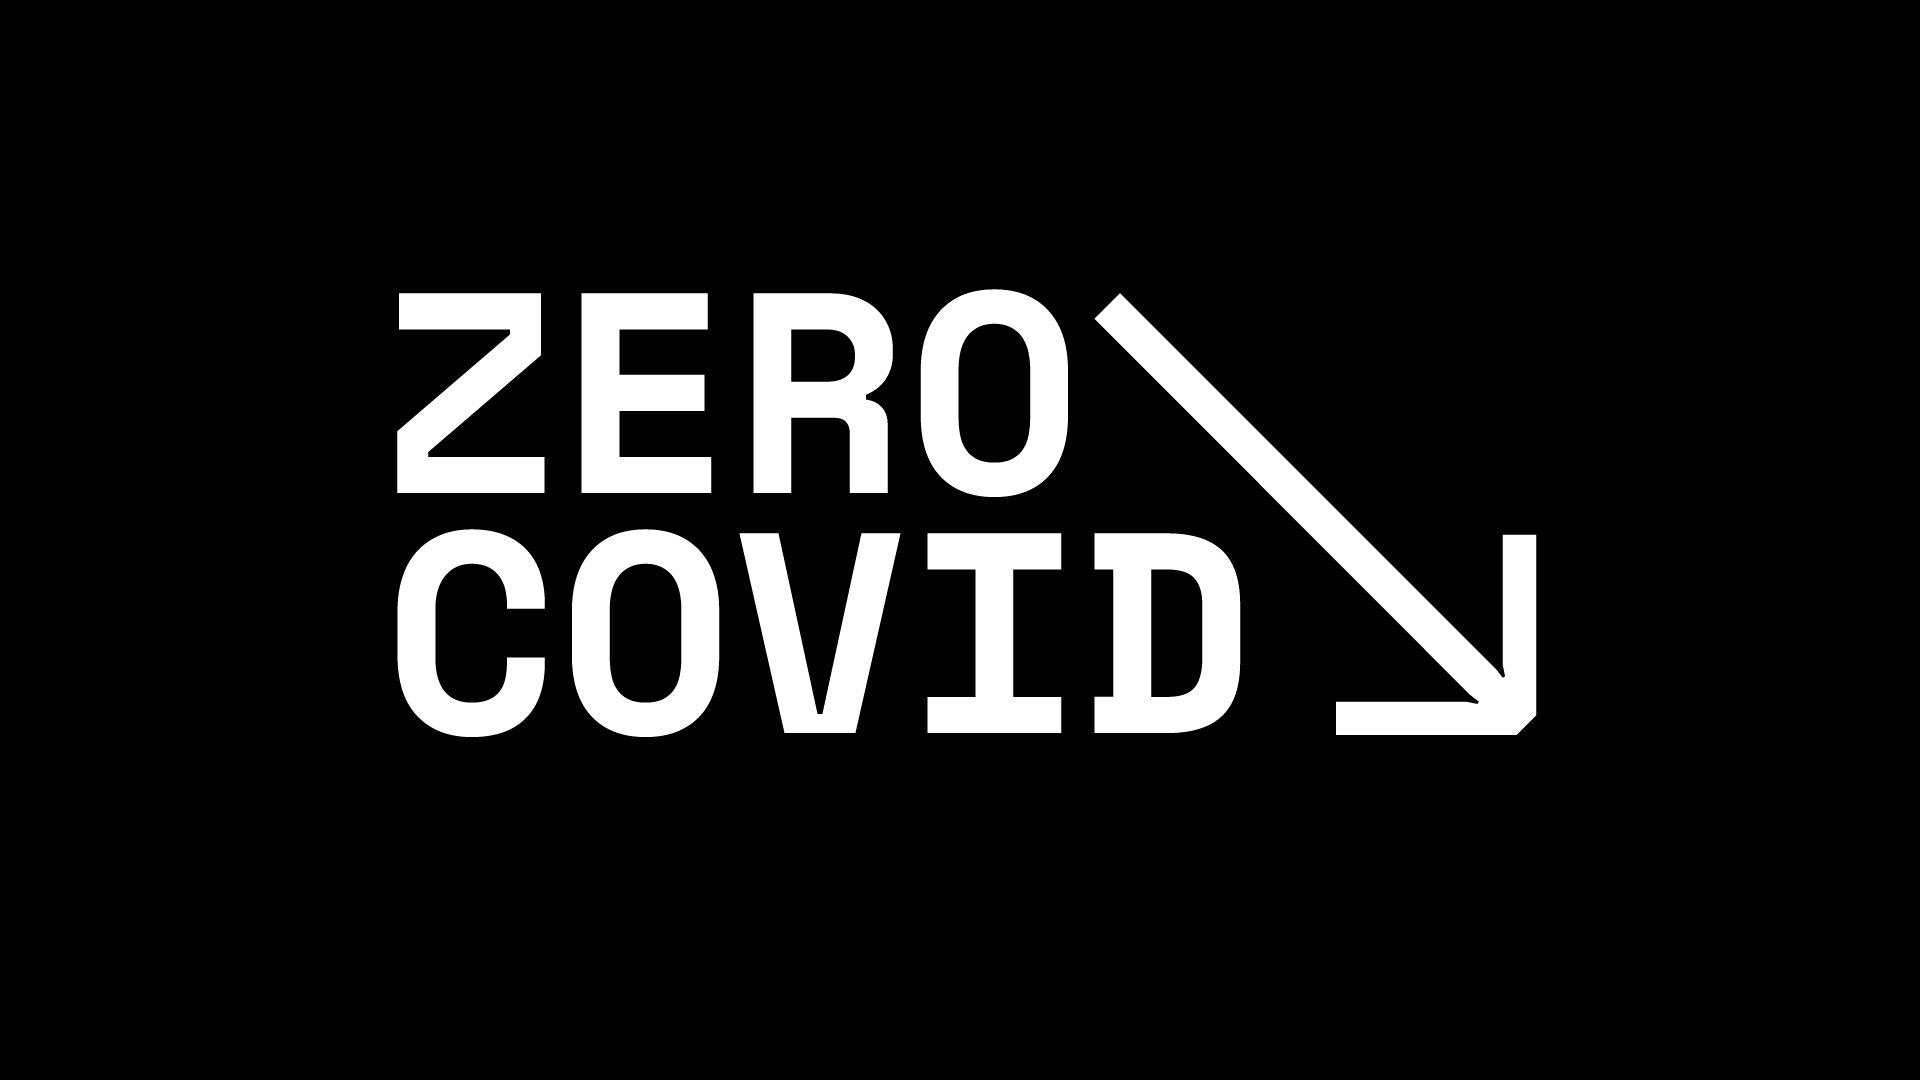 #ZeroCovid